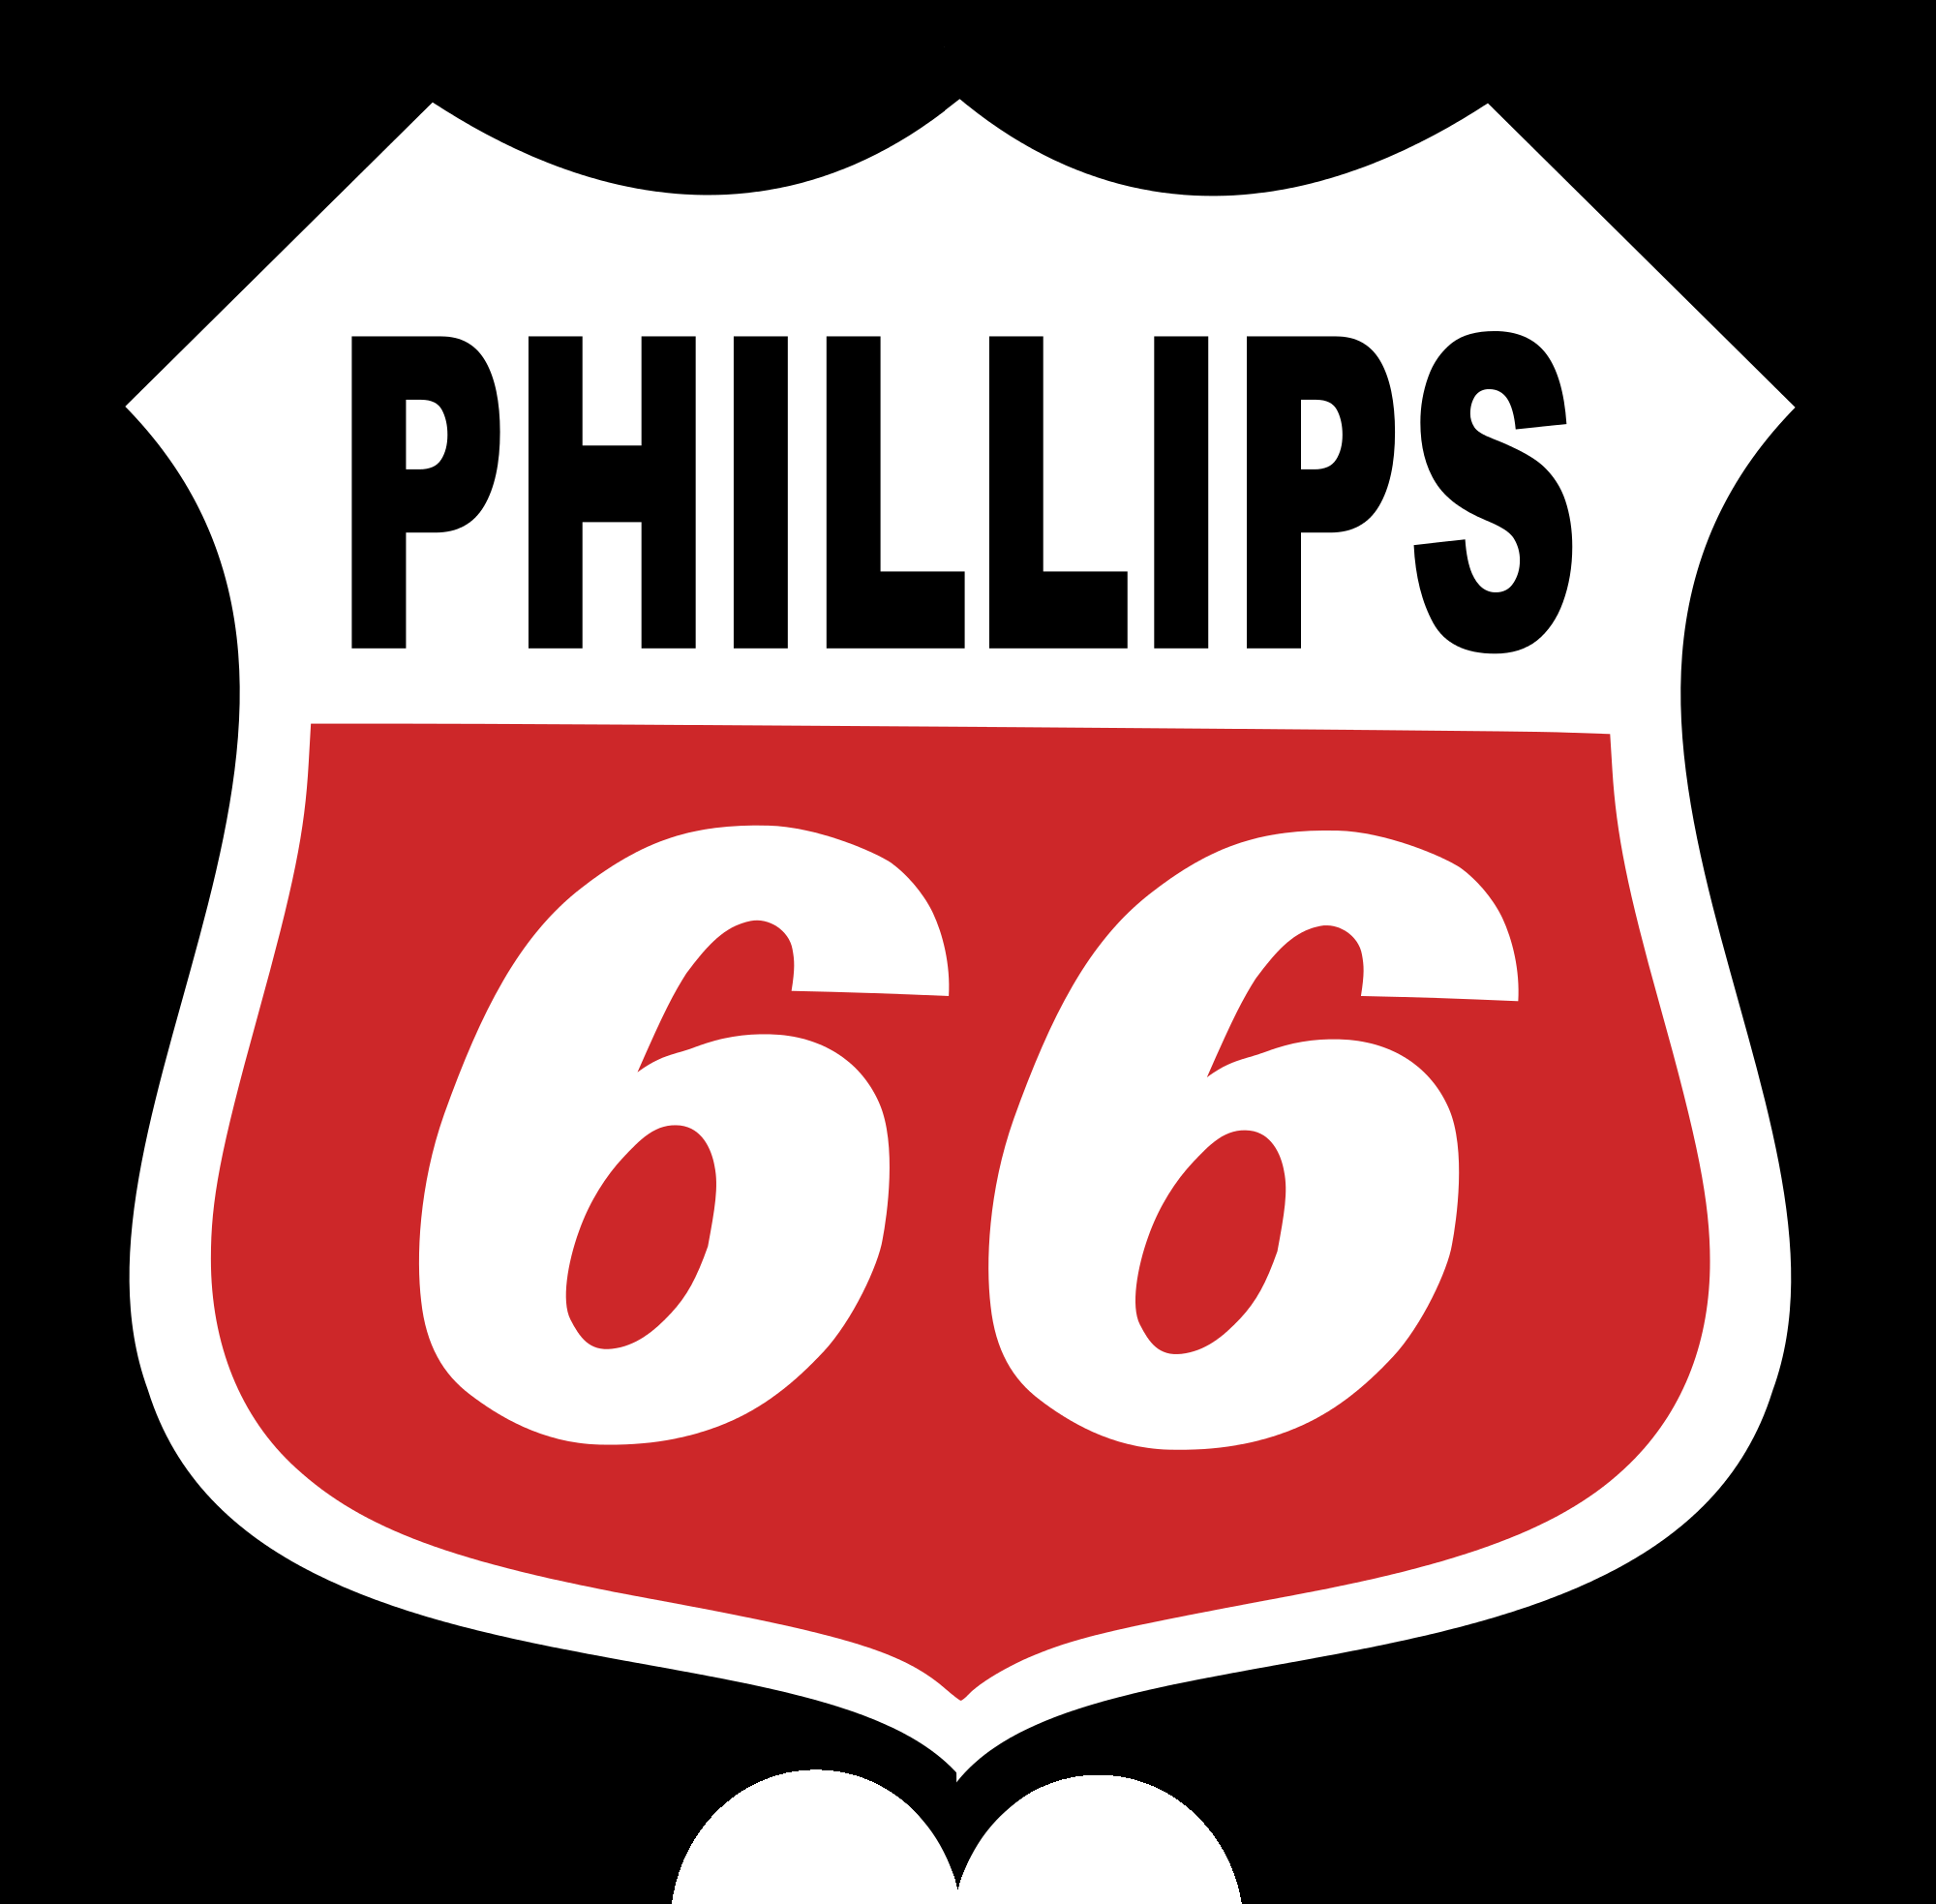 Phillips 66 Philgear Industrial Lube 460 Cross Ref